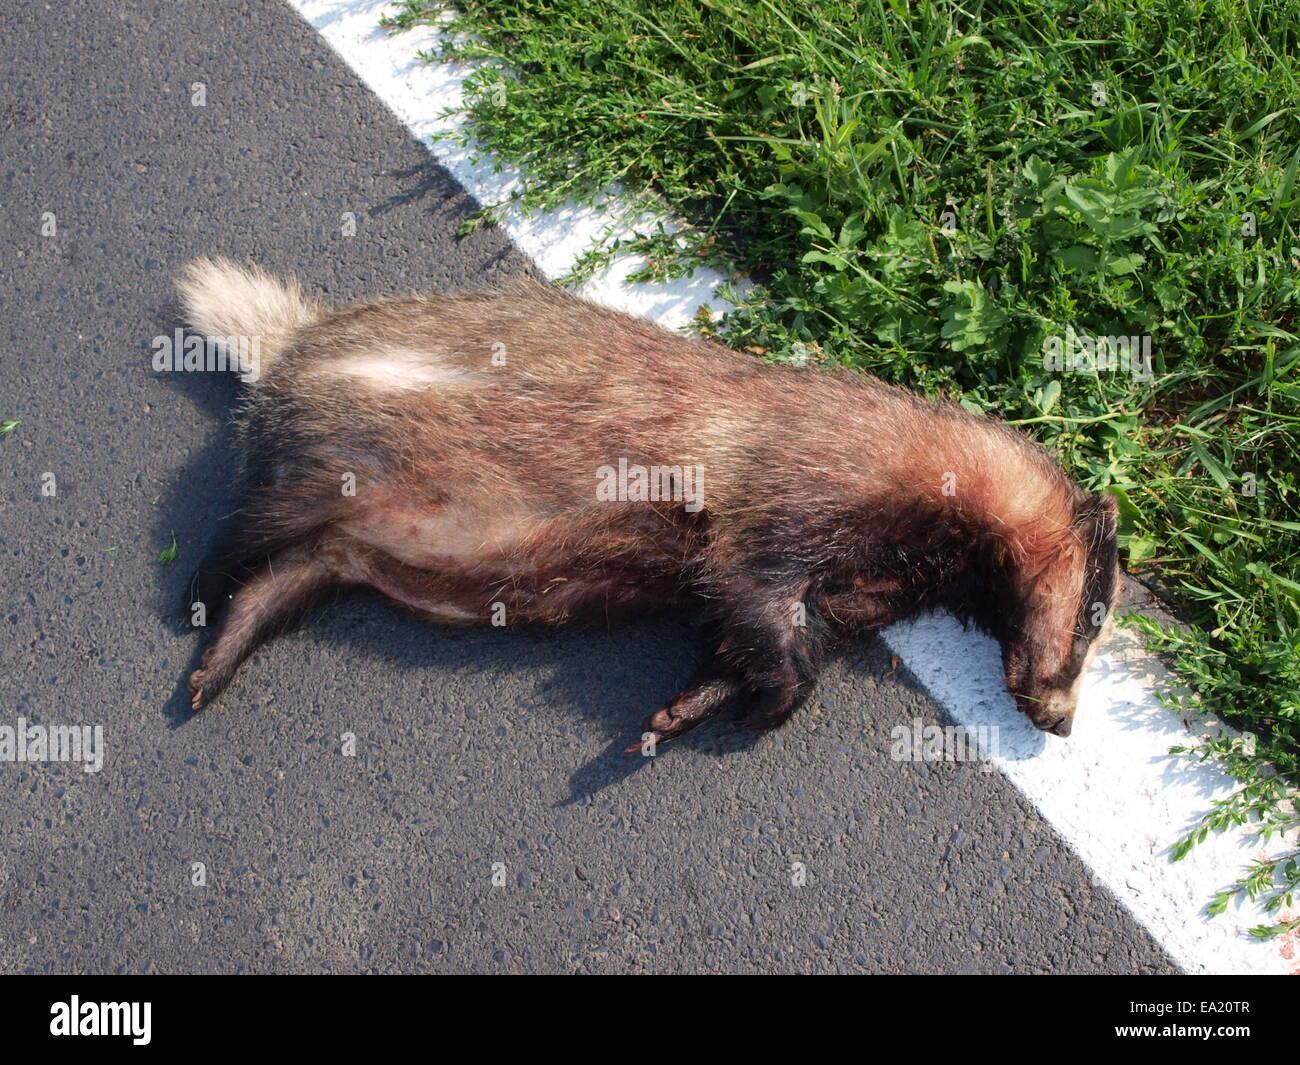 Badger as traffic victim - Stock Image